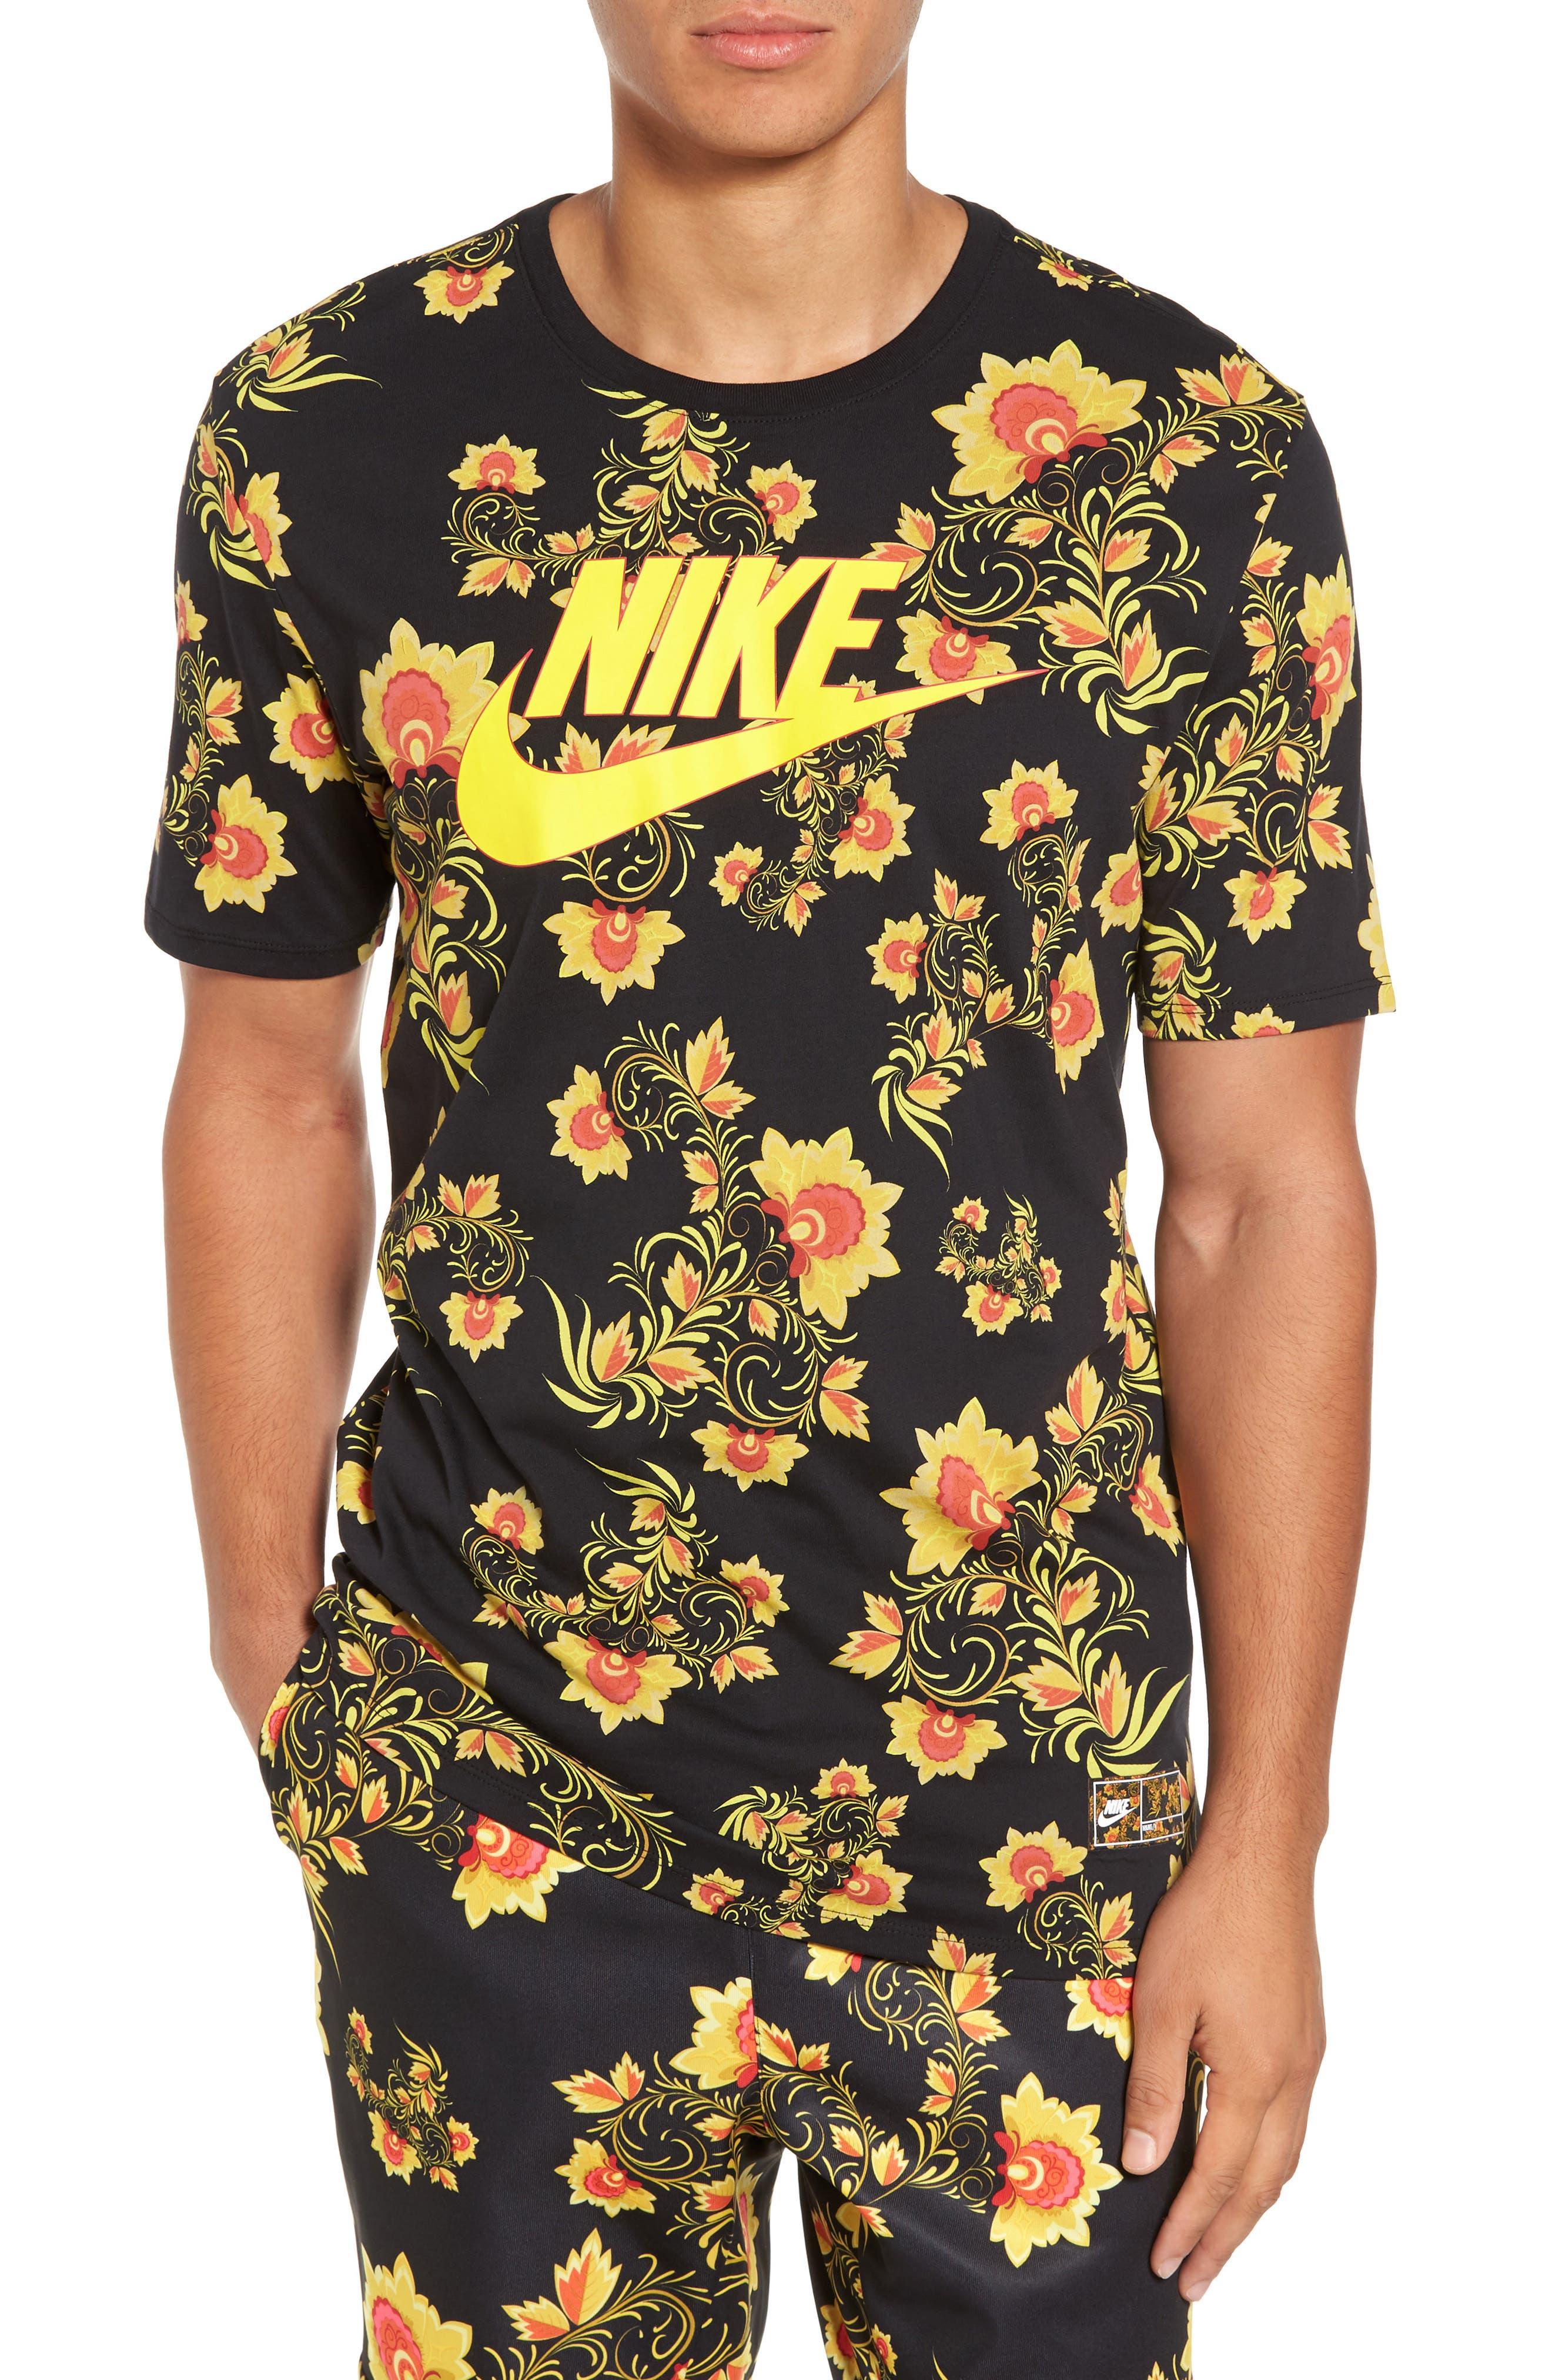 NSW Concept T-Shirt,                             Main thumbnail 1, color,                             Black/ Tour Yellow